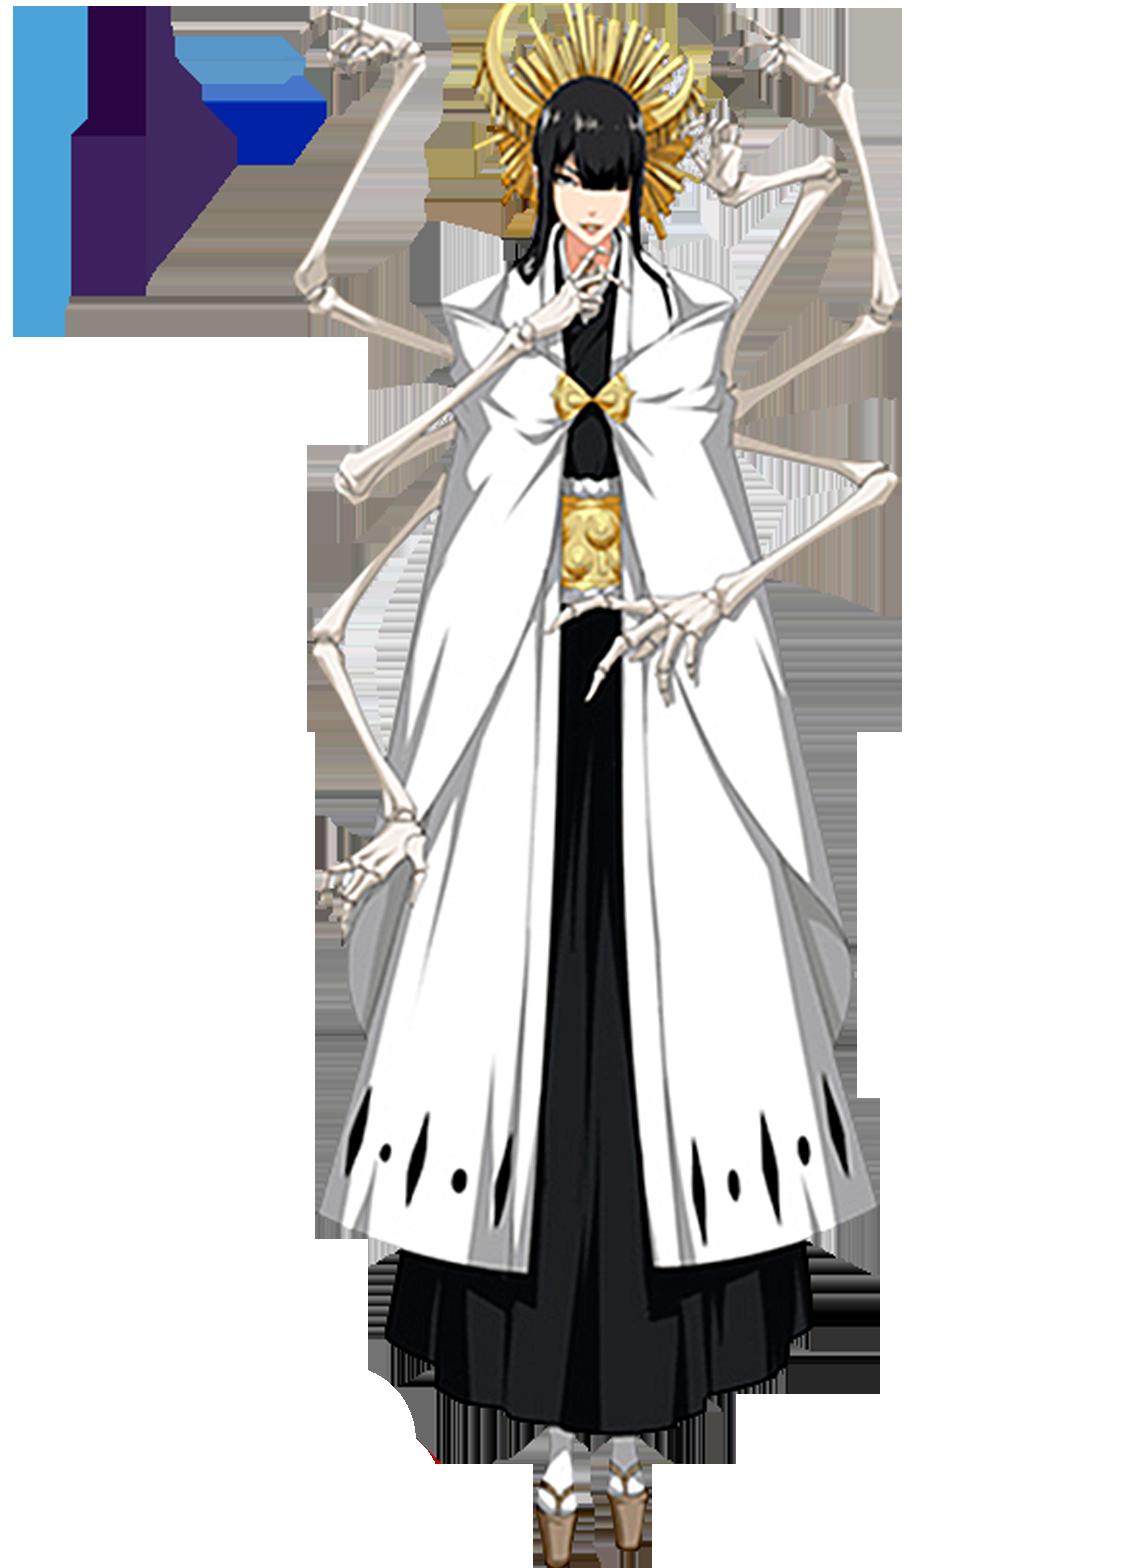 Senjumaru Shutara